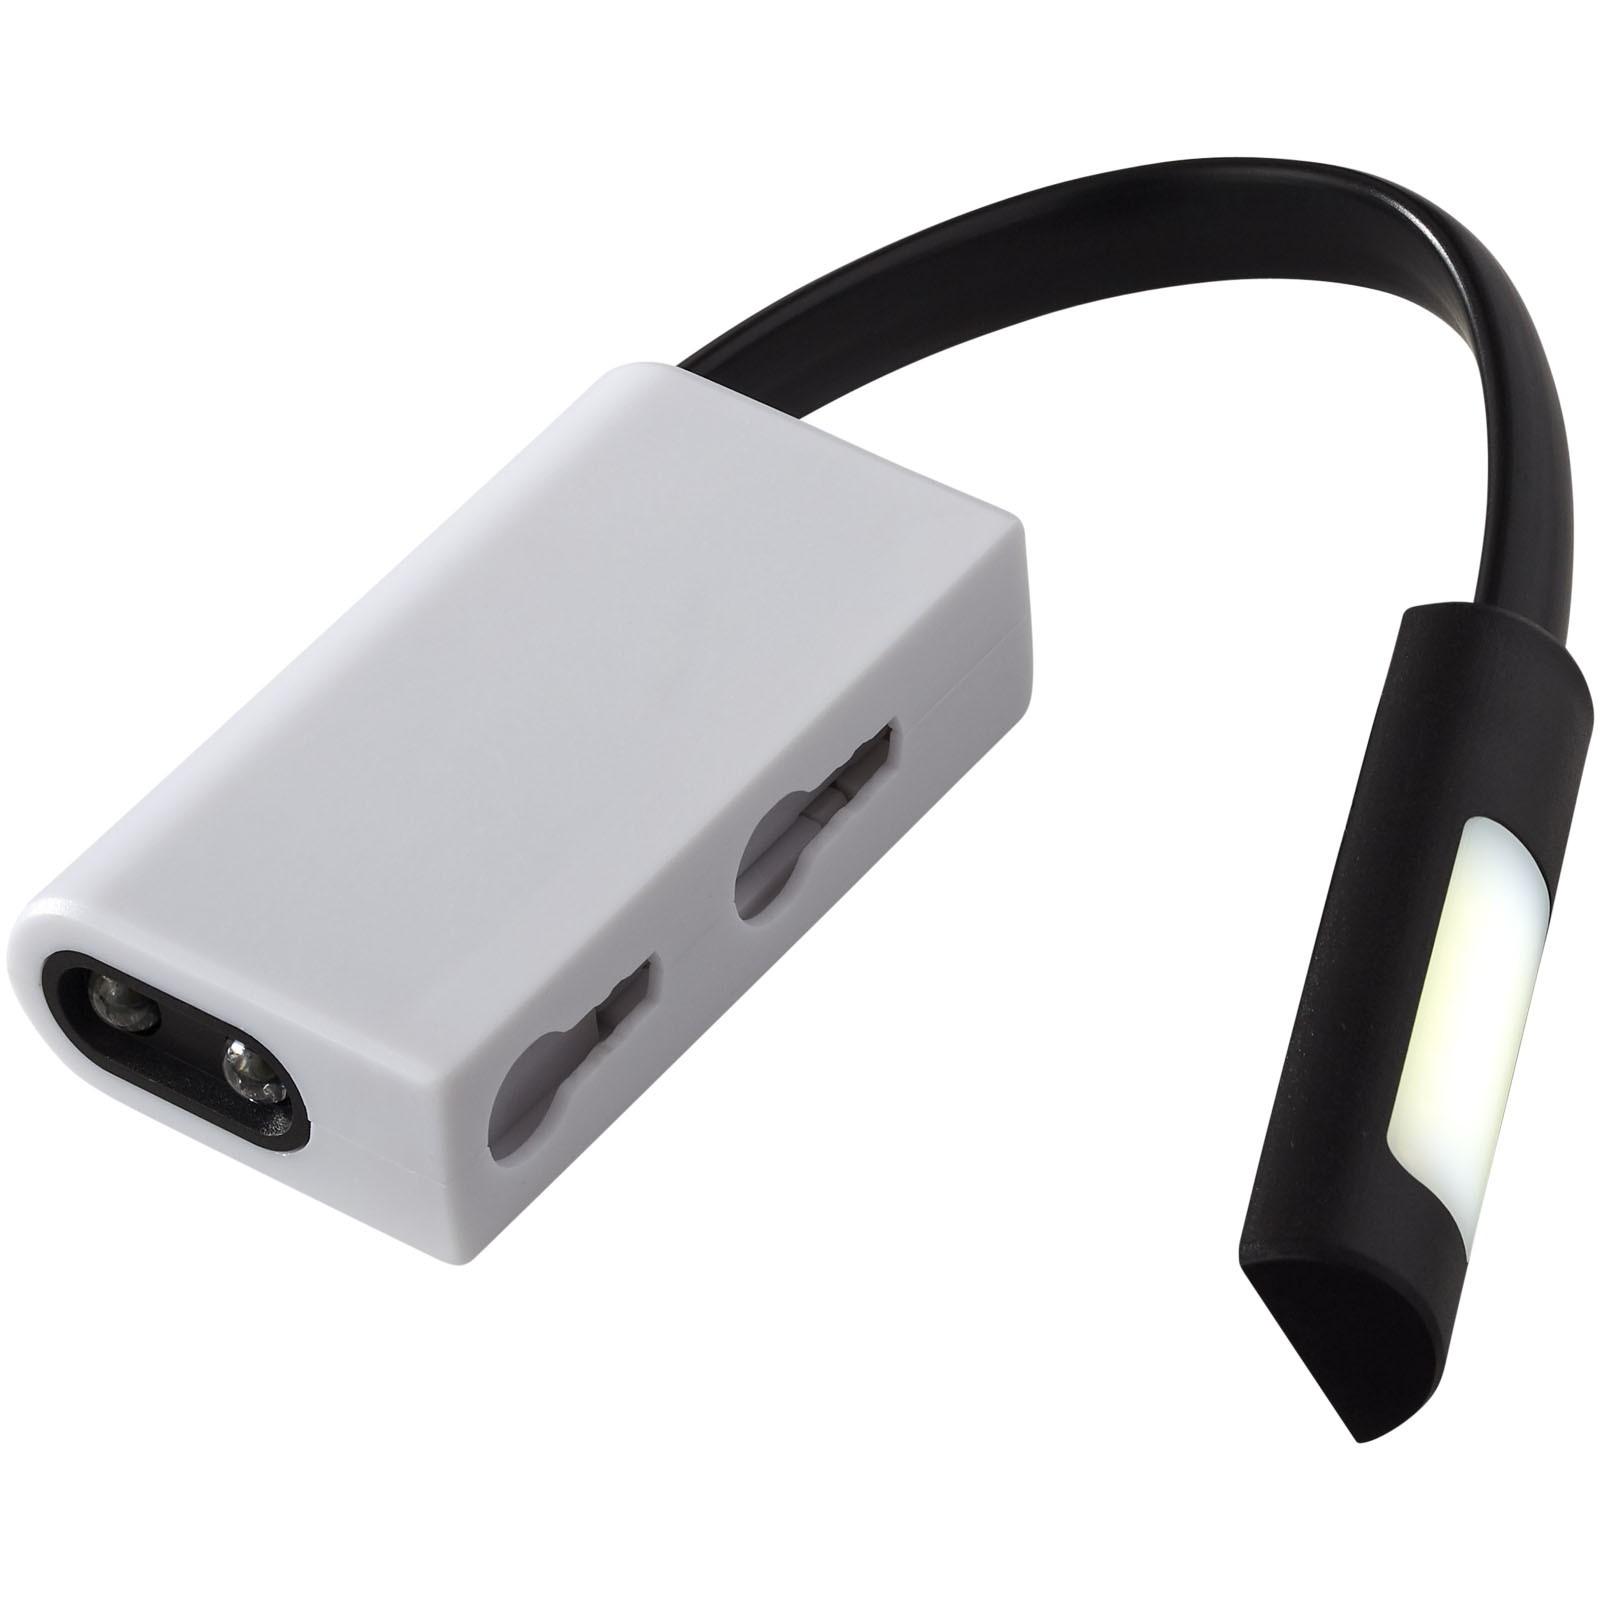 COB a LED svítilna Libra - Černá / Bílá